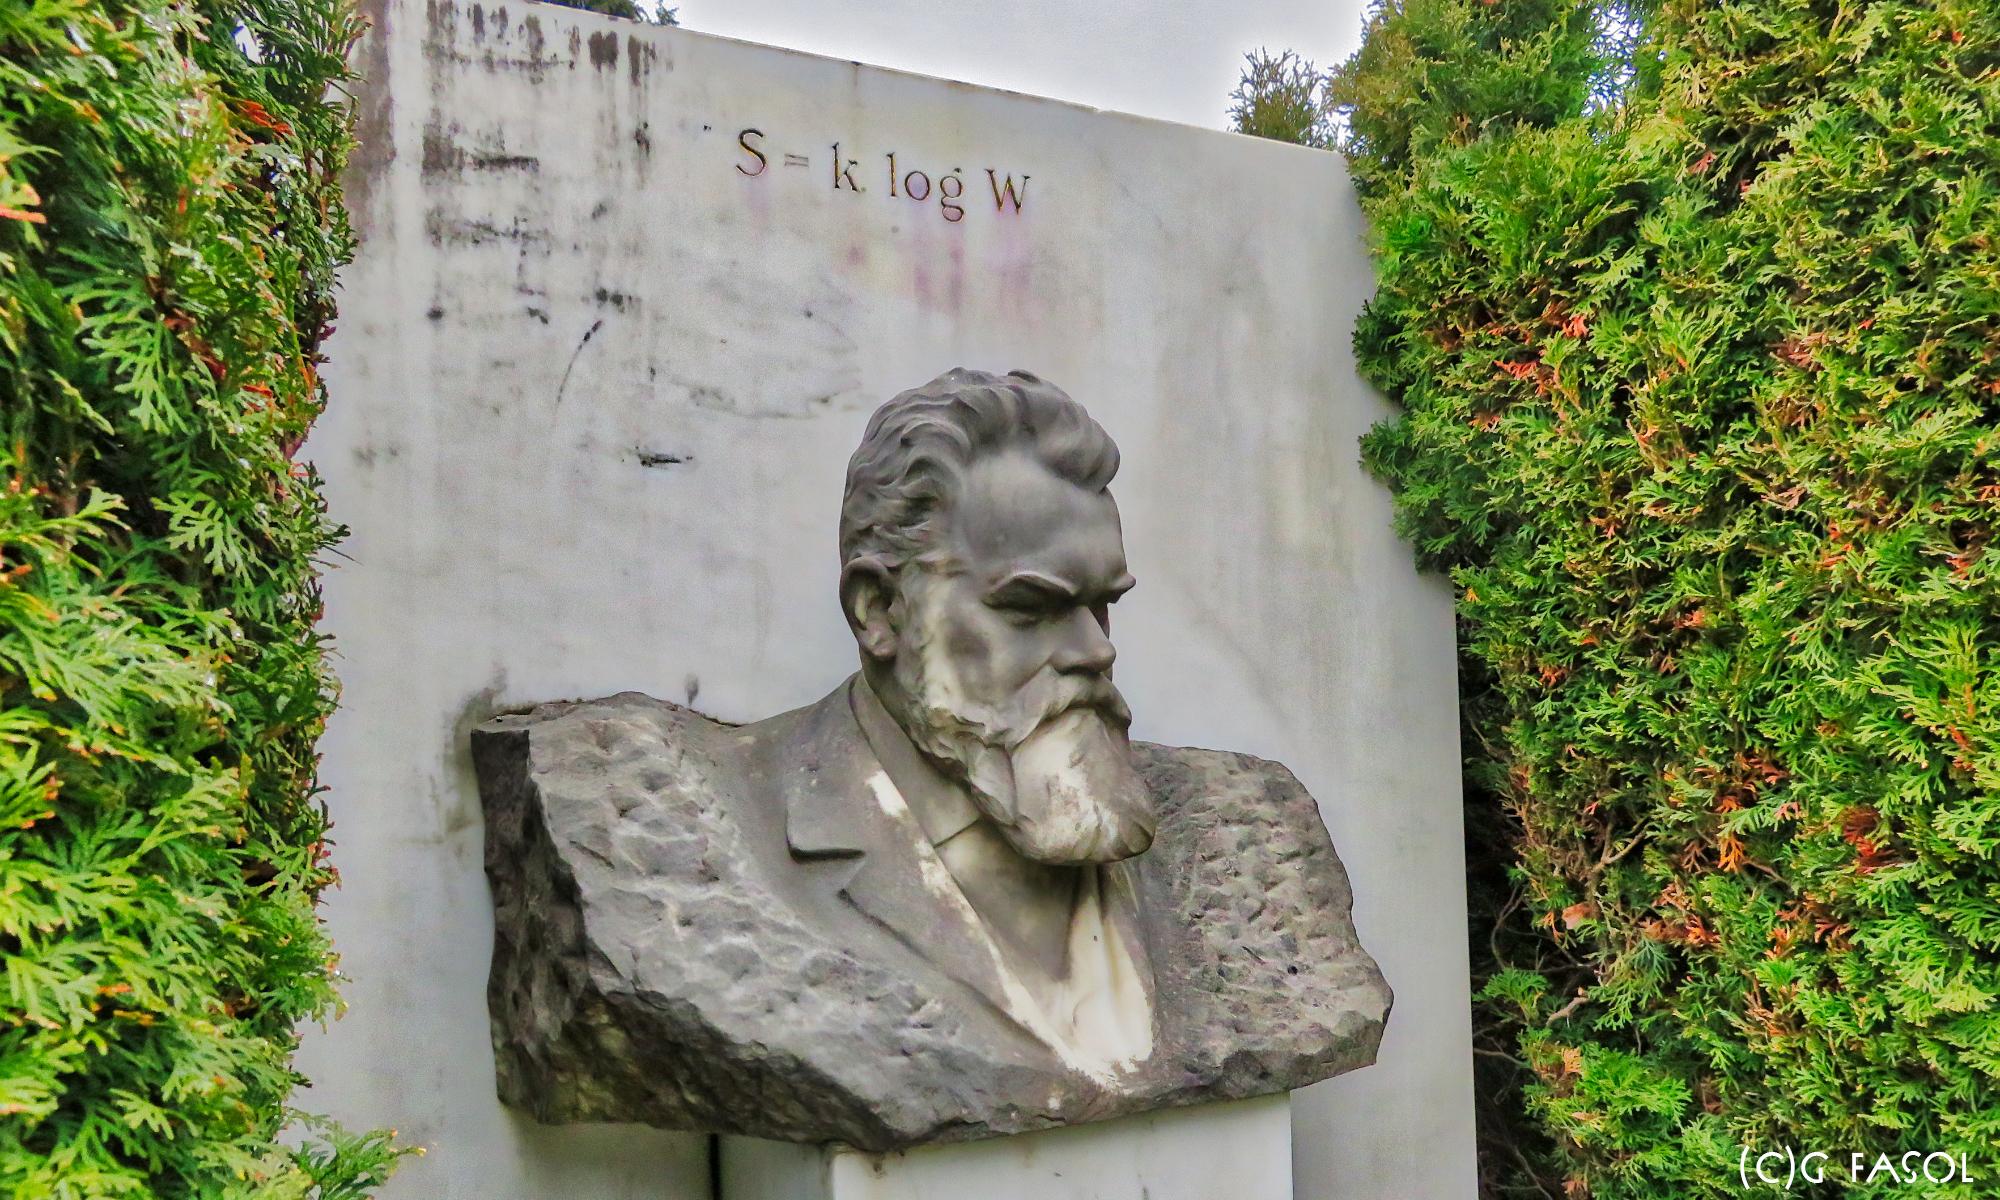 Ludwig Boltzmann's grave stone on the Vienna Zentralfriedhof (Central Cemetery) S = k log W (c)Gerhard Fasol